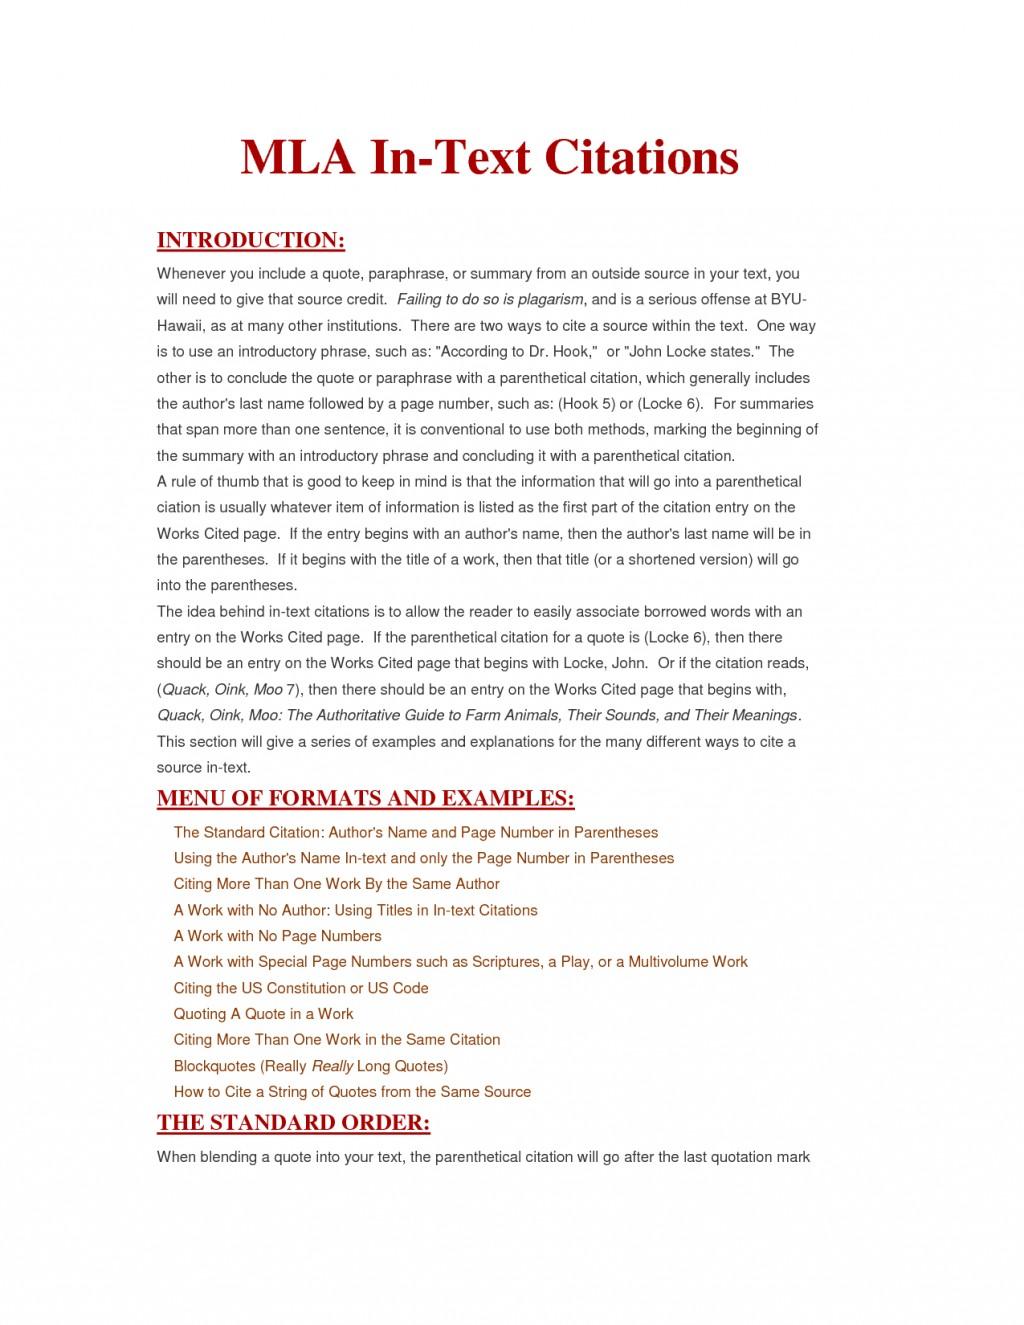 014 Mla Essay Citation Format Mersn Proforum Cos In Essays Apa Staggering Examples Citing Large